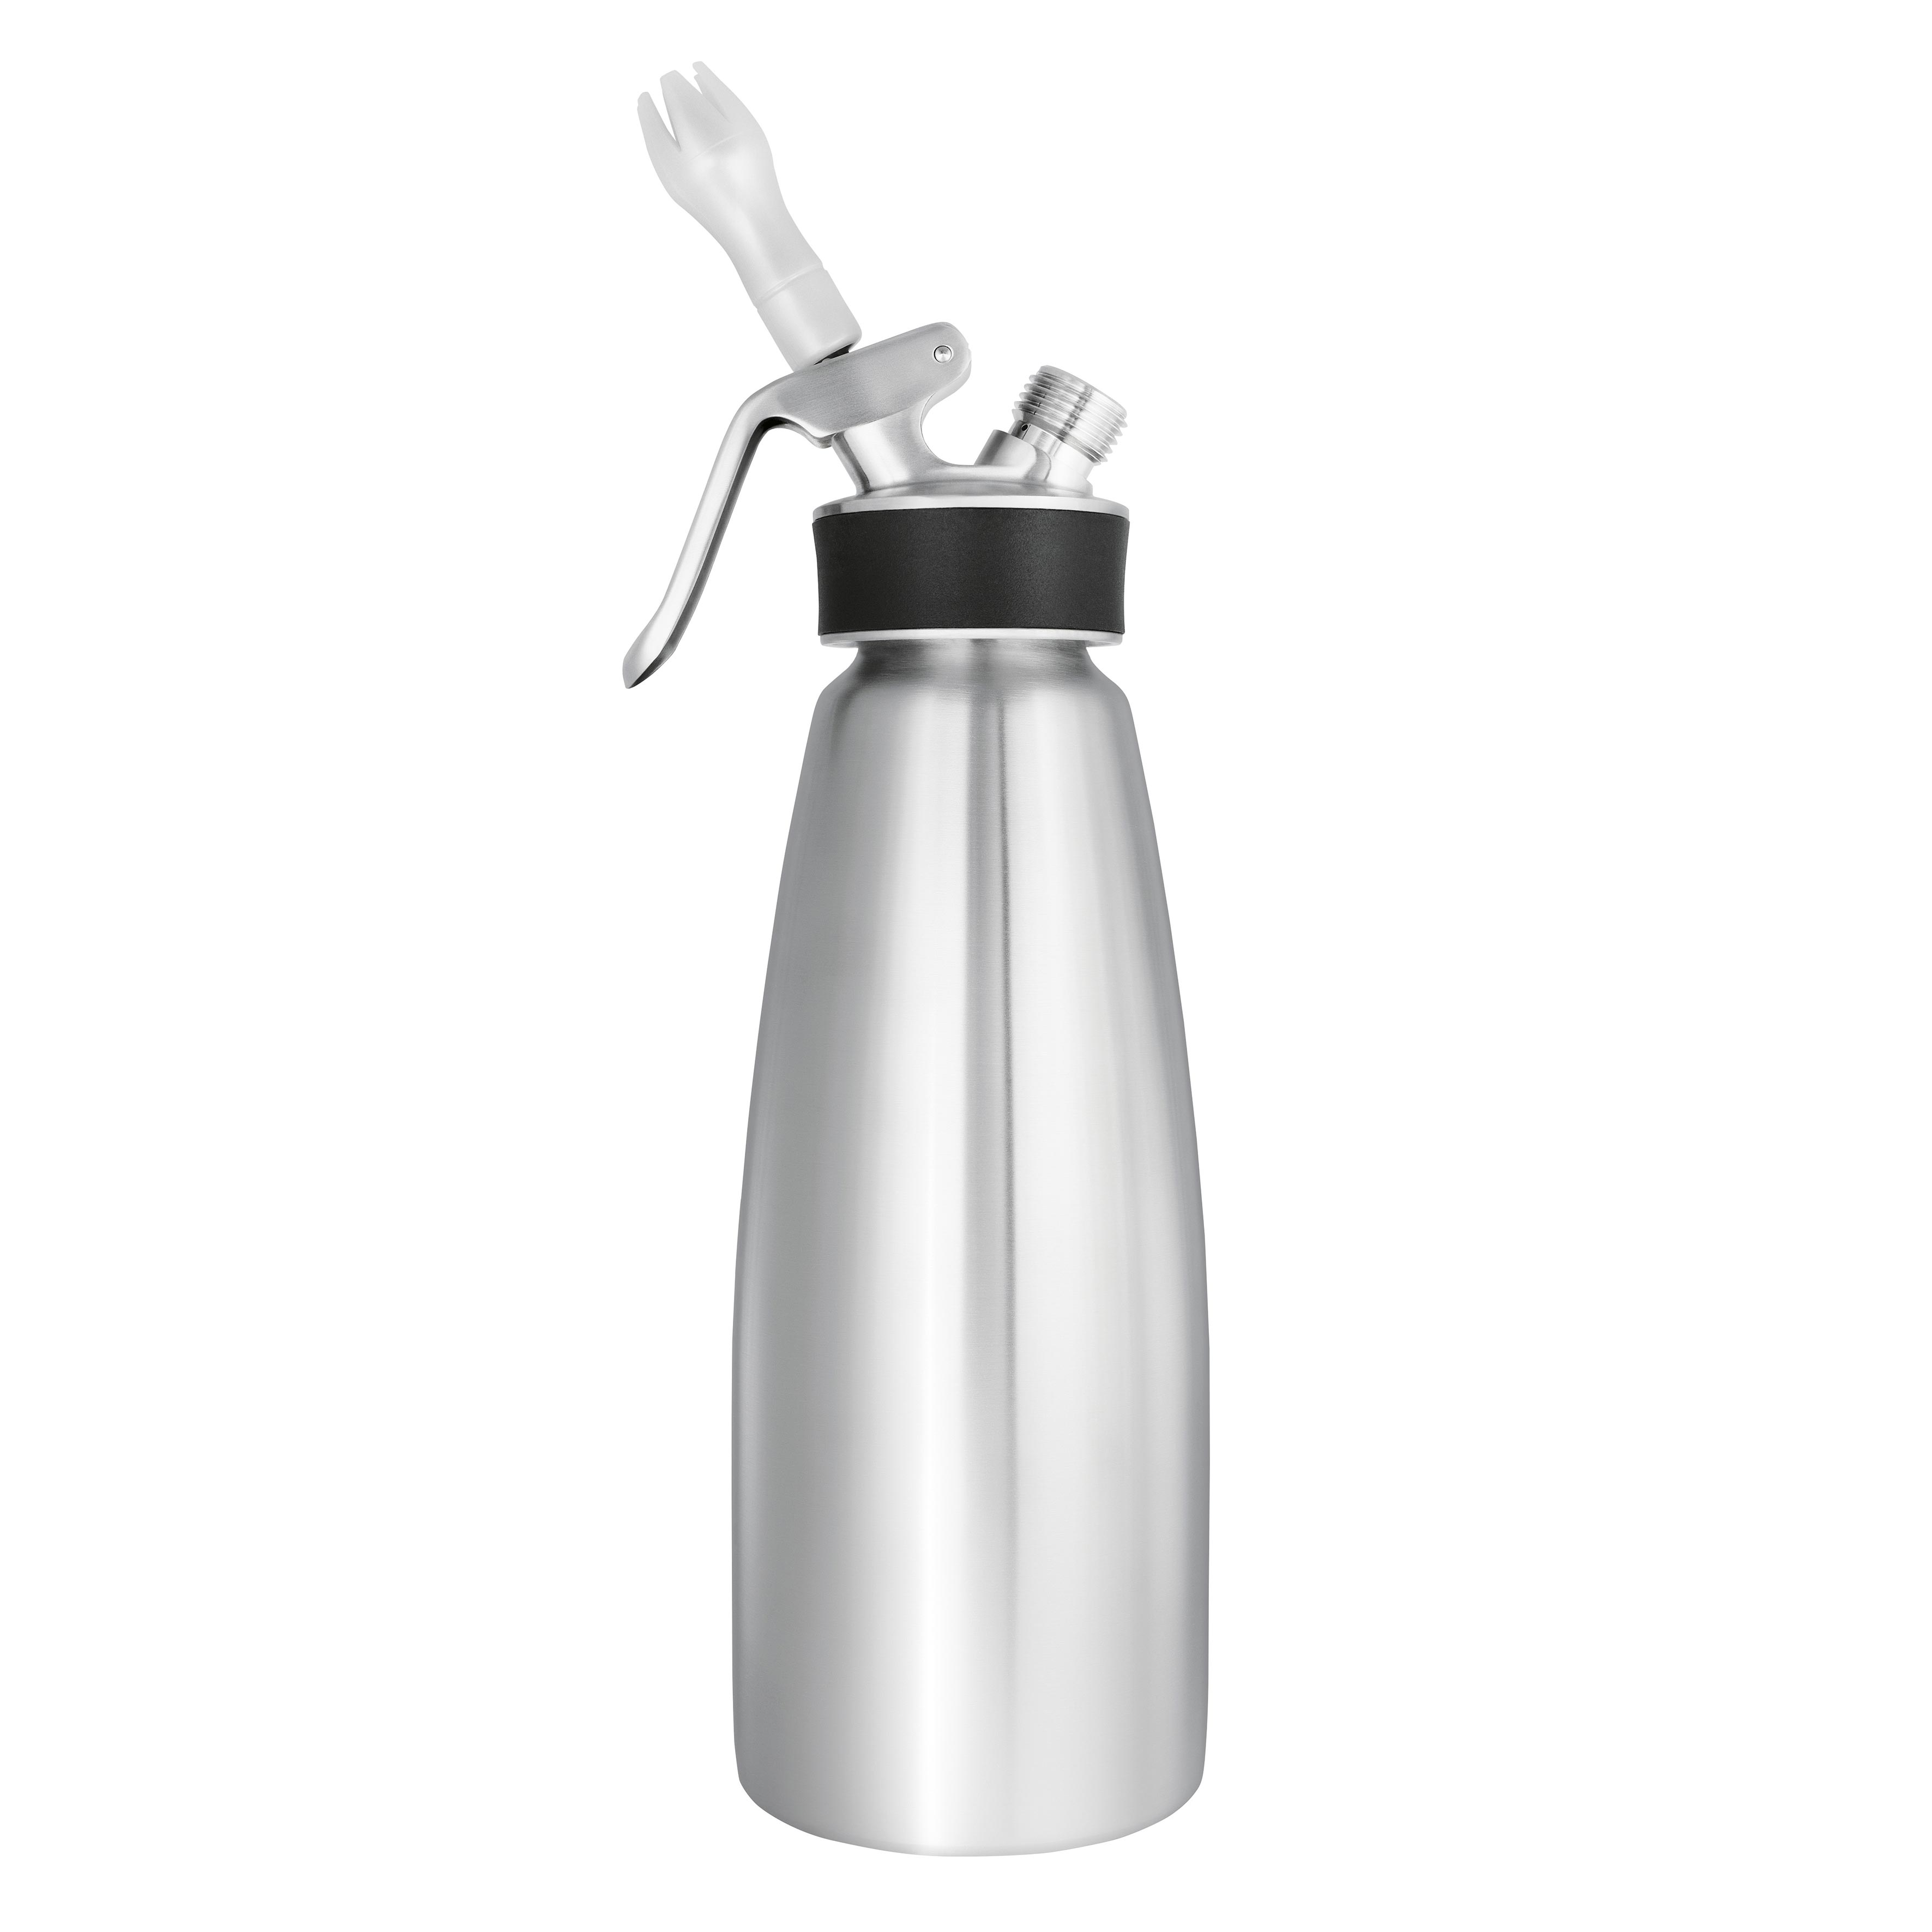 Syphon 1 Liter Sahne-Syphon